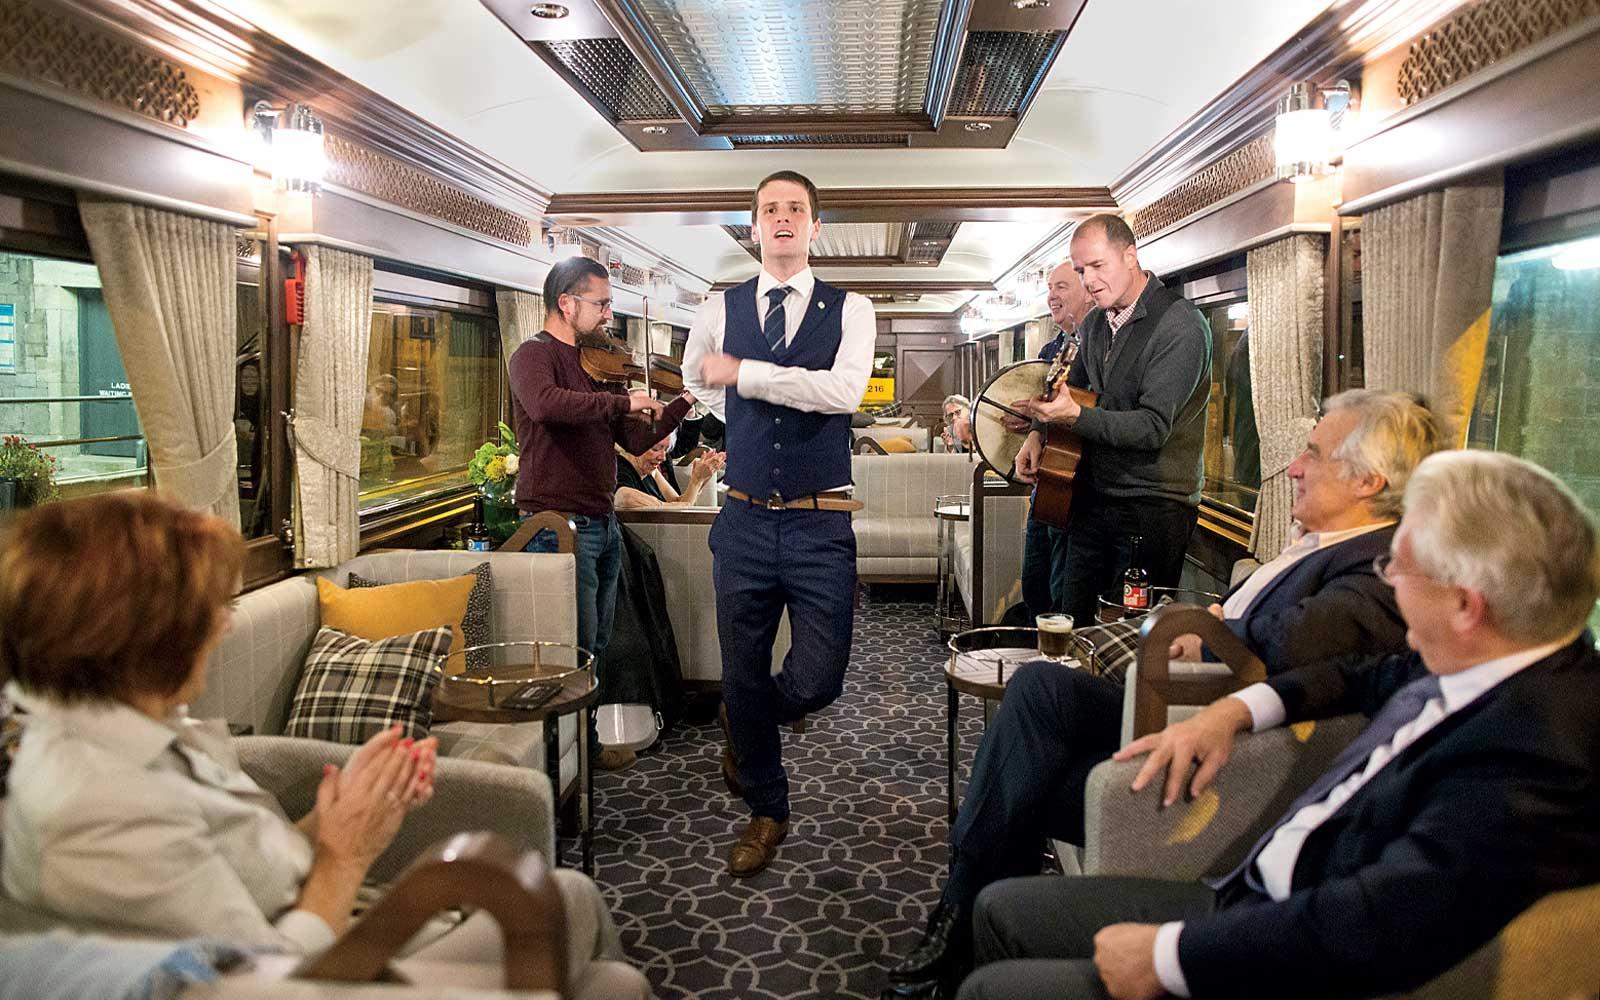 irish-jig-belmond-grand-hibernian-train-BUCKETTRAIN1117.jpg